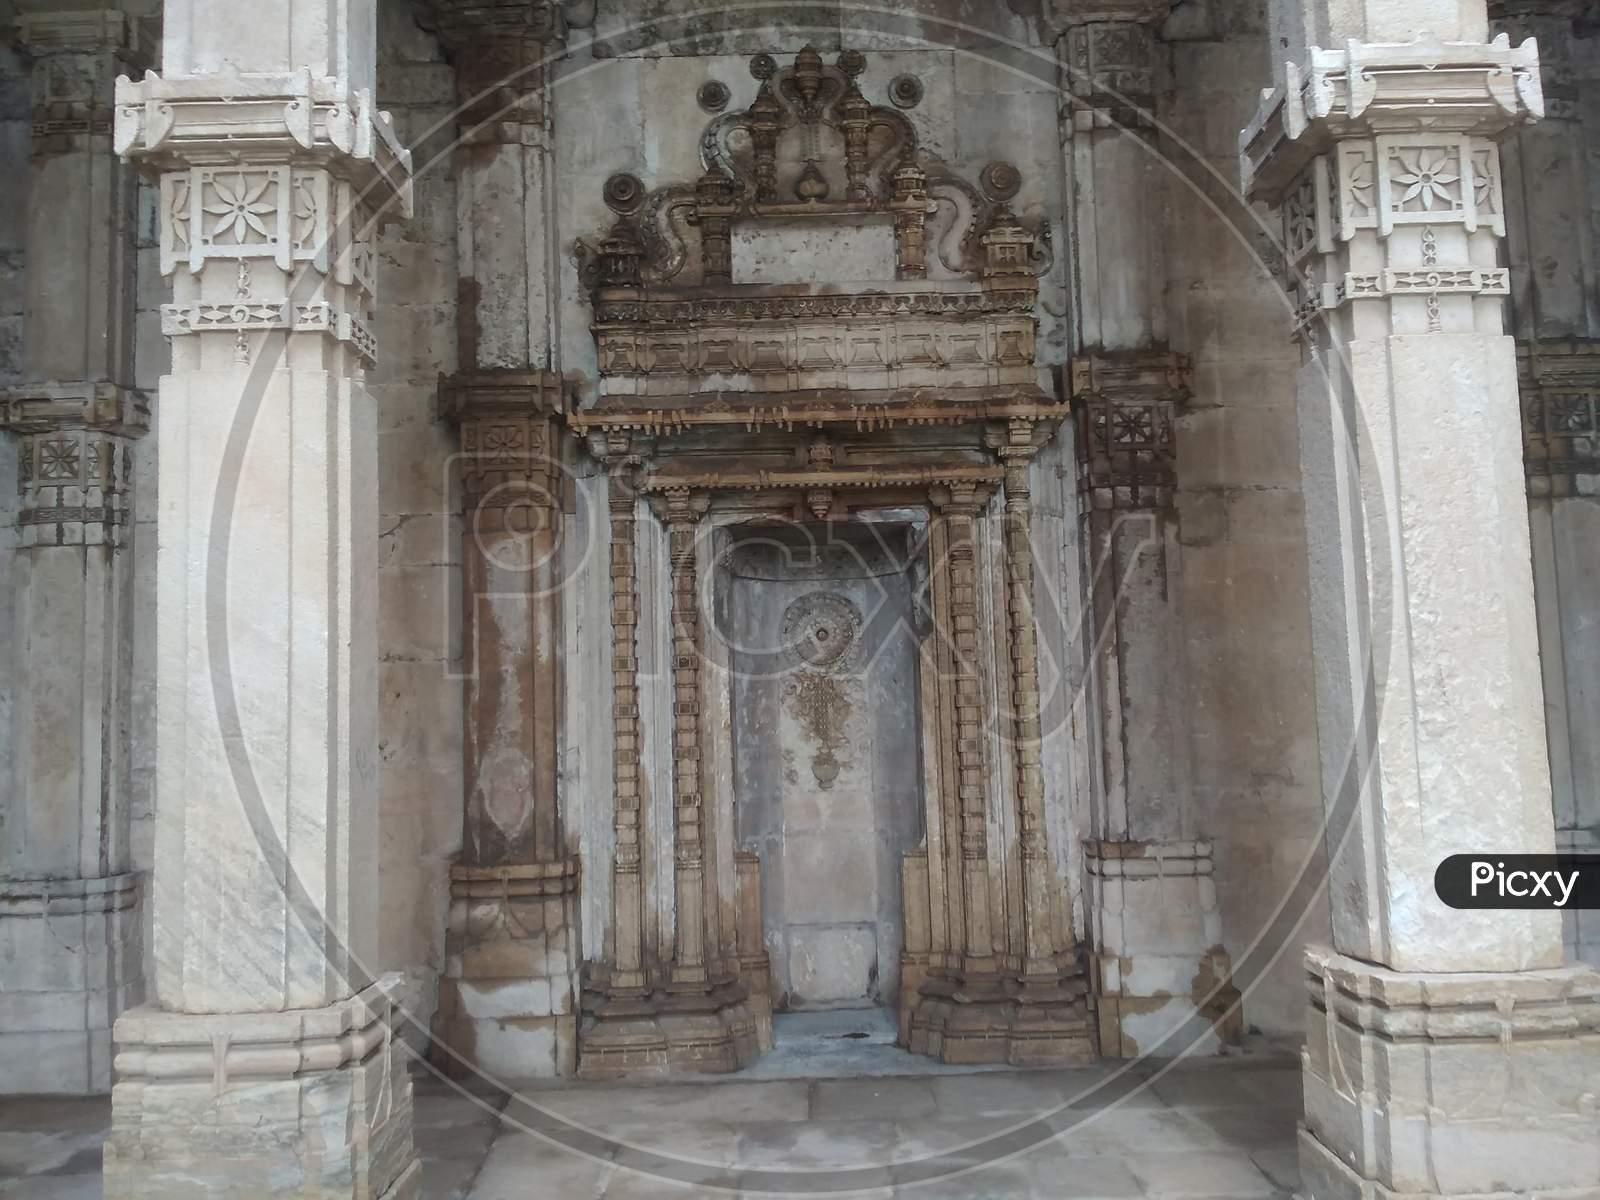 Old palace and ruins